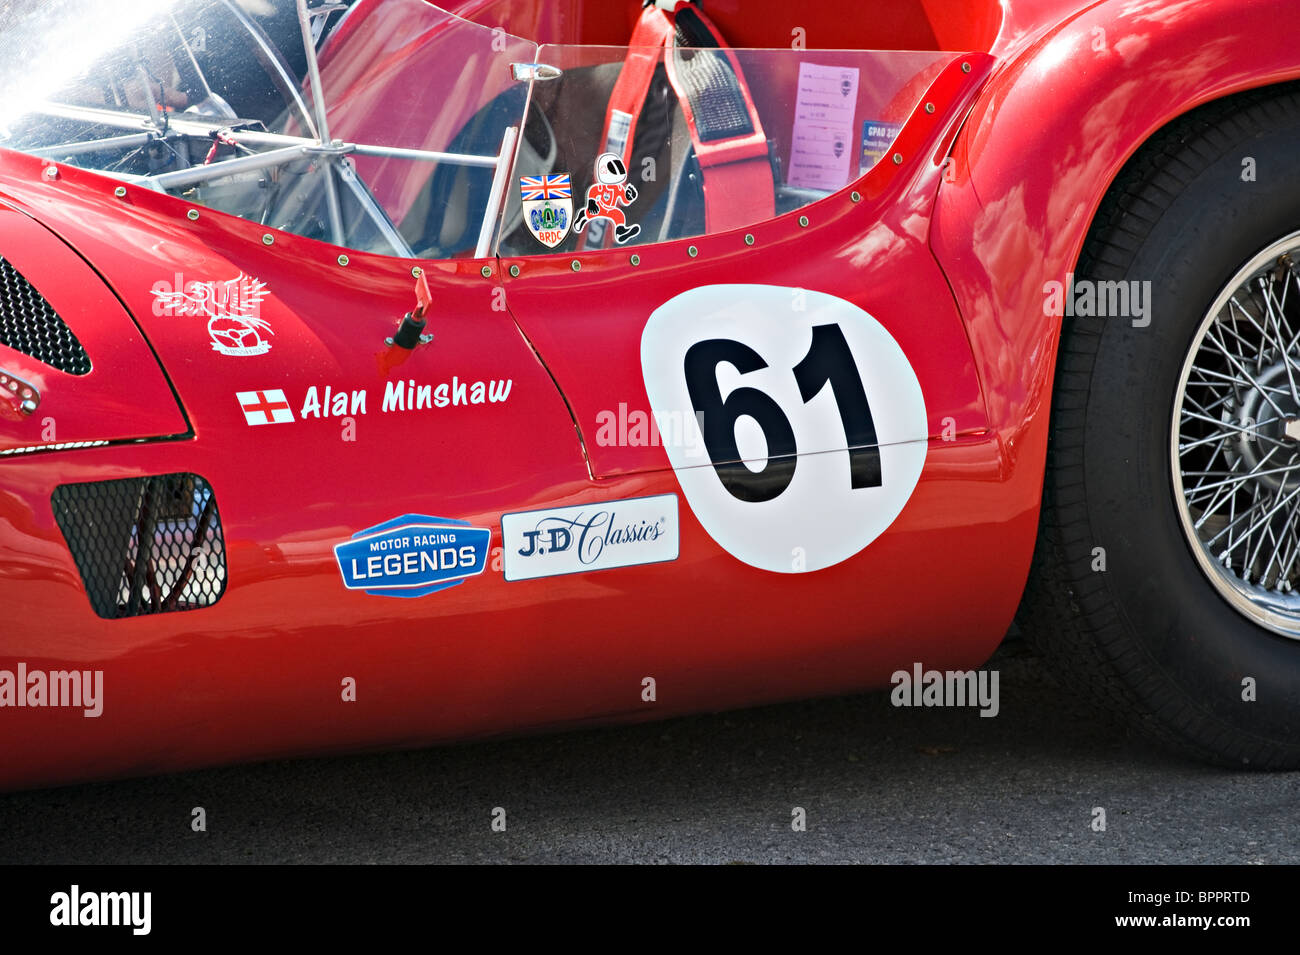 Closeup of Red Maserati T61 Birdcage at Oulton Park Motor Racing Circuit Cheshire England United Kingdom UK - Stock Image